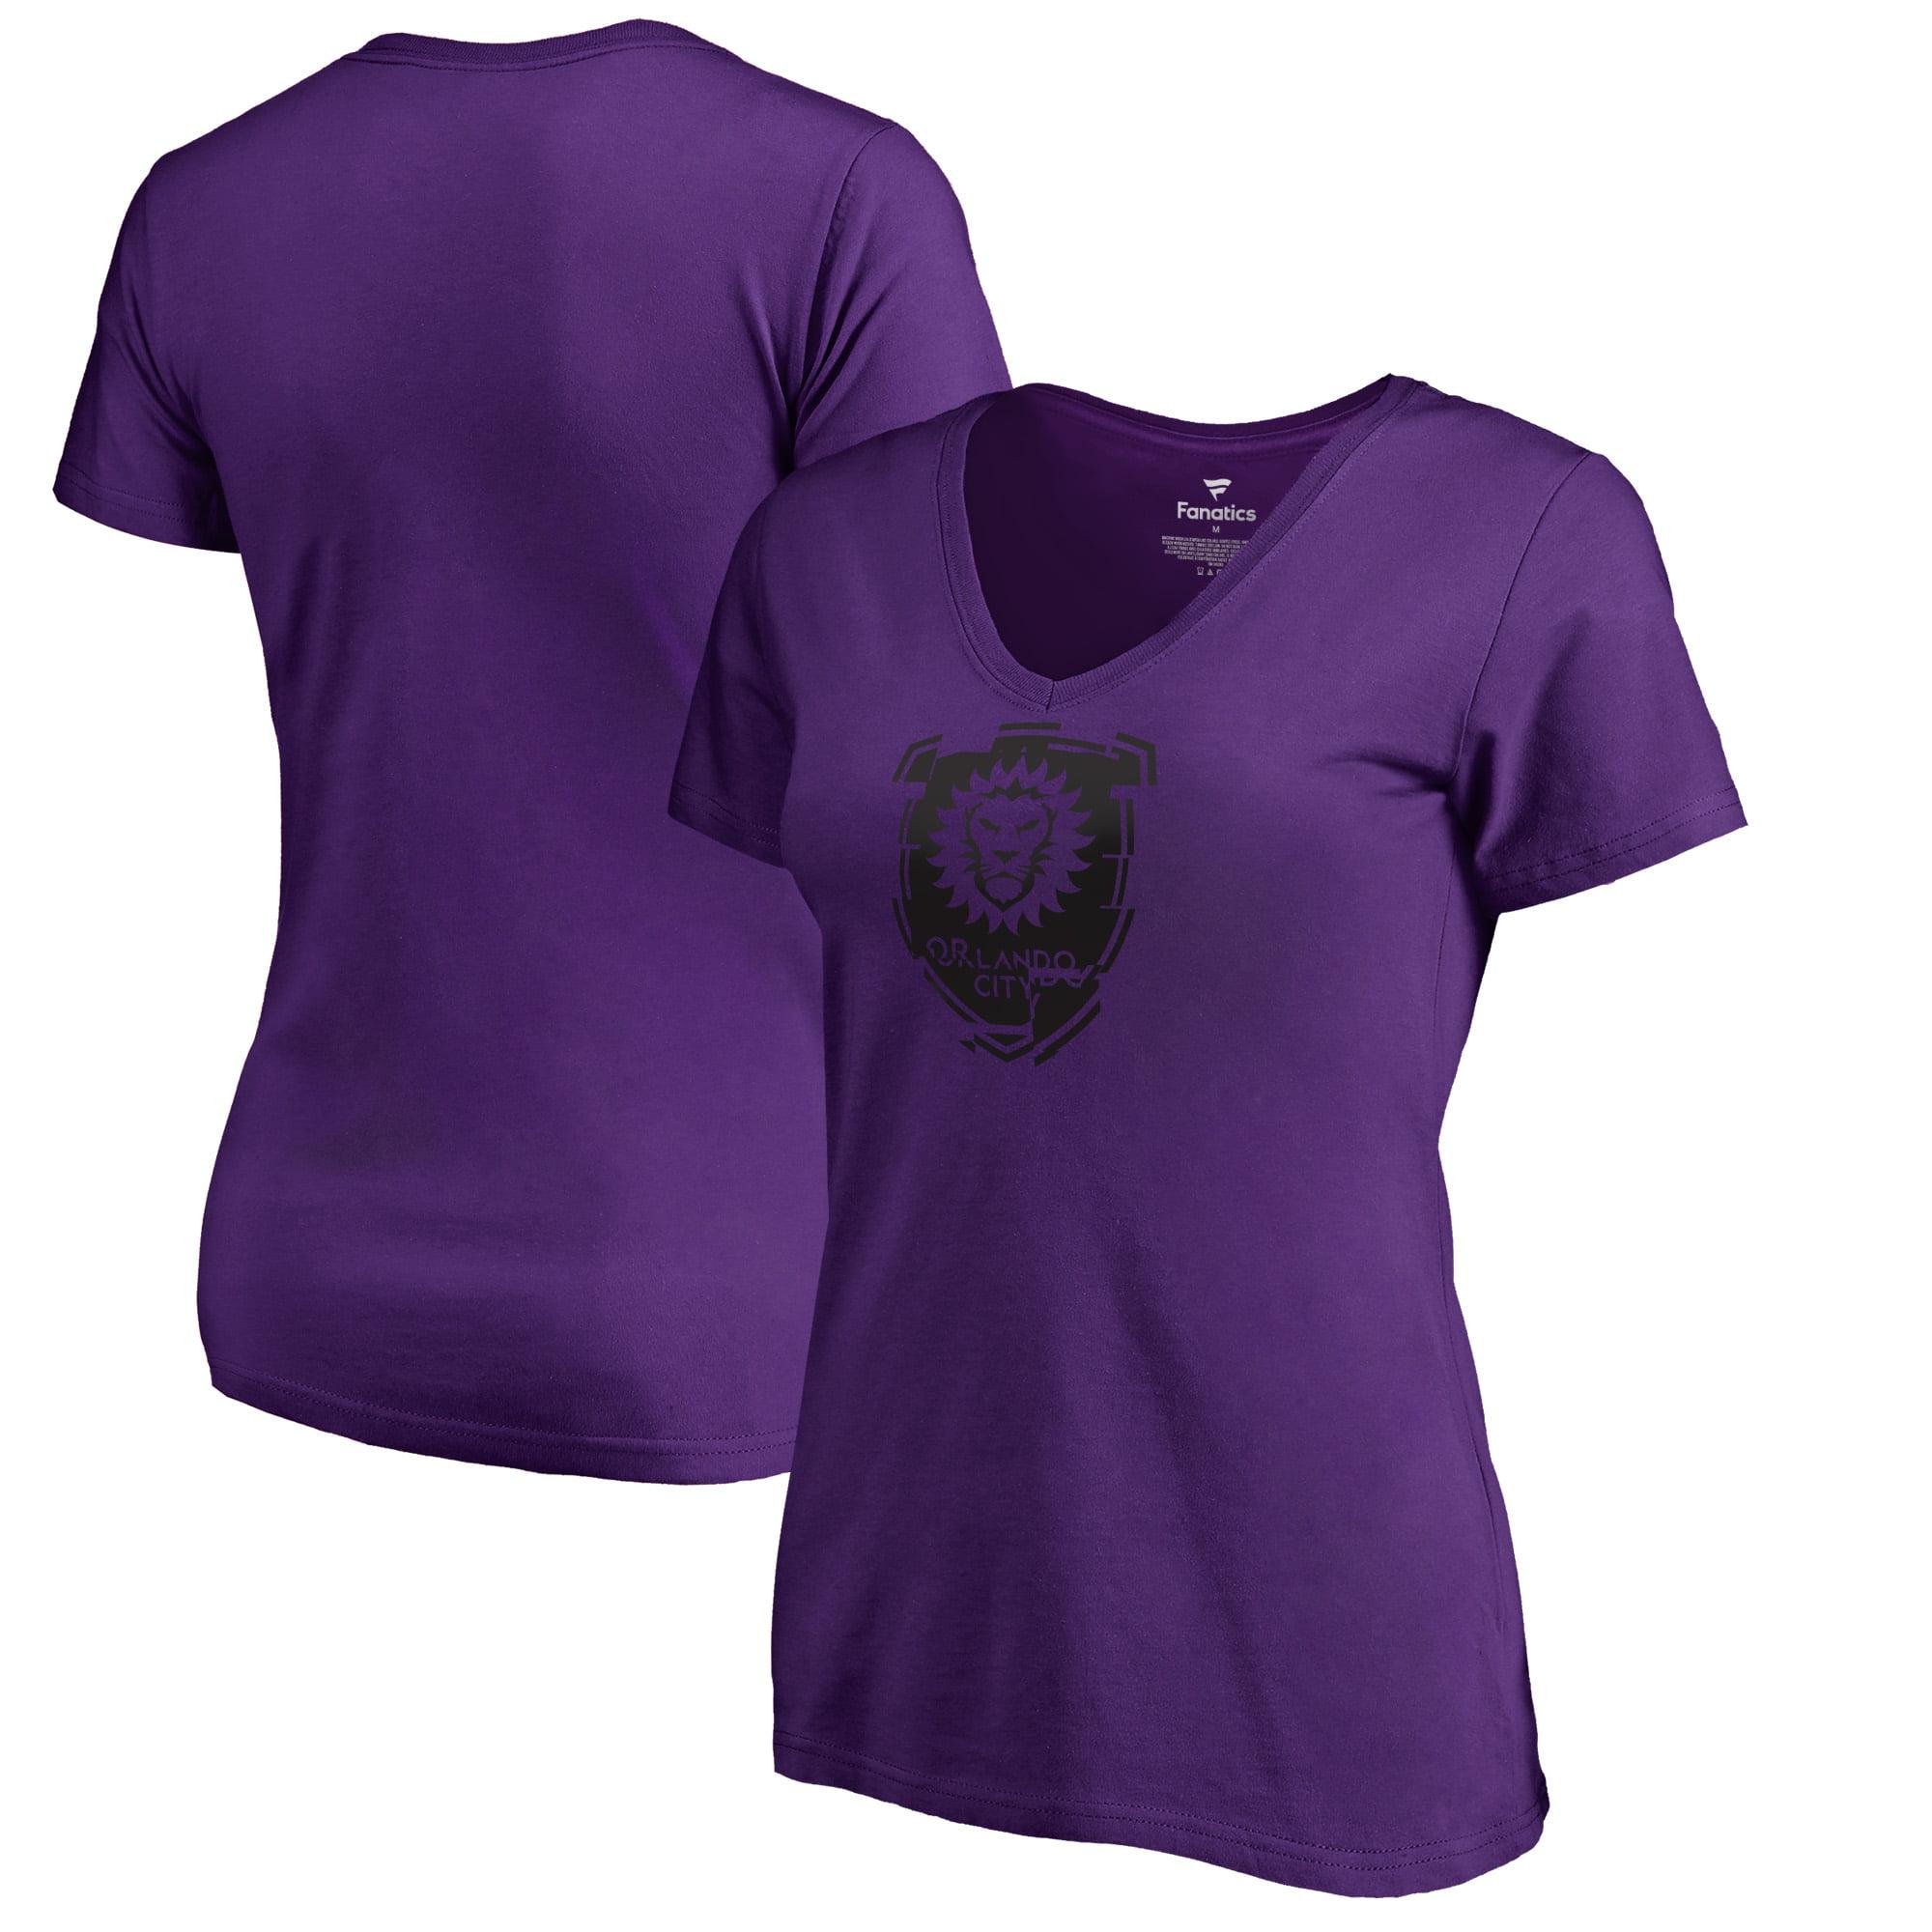 Orlando City SC Fanatics Branded Women's League Trend V-Neck T-Shirt - Purple